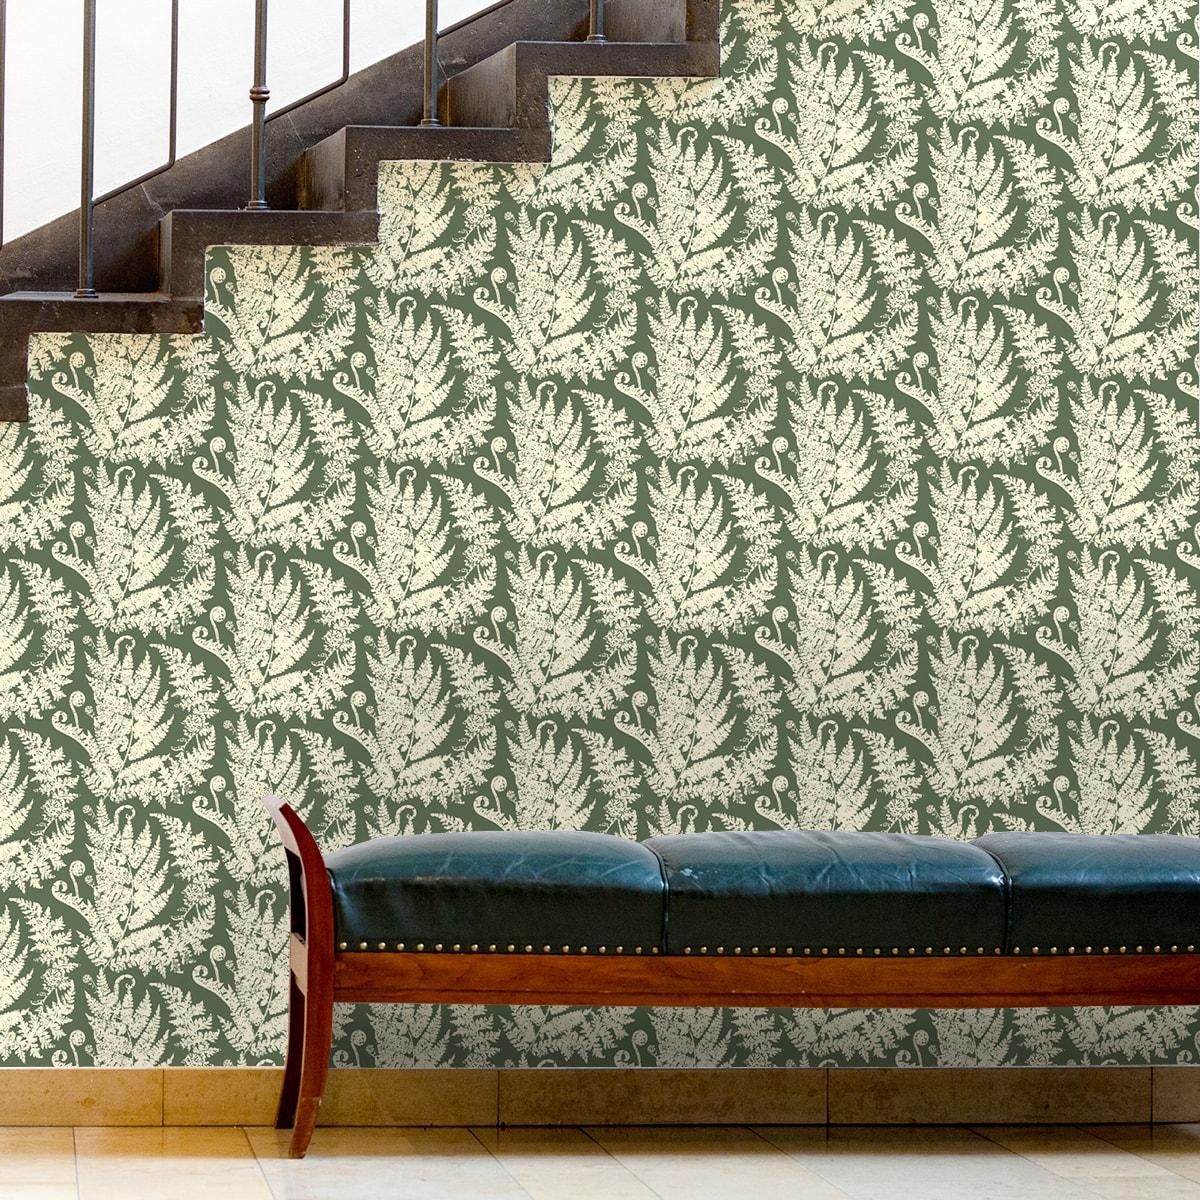 """Heidis Fernerie"" Tapete mit großem Farn Muster in grün angepasst an Little Greene Wandfarben"